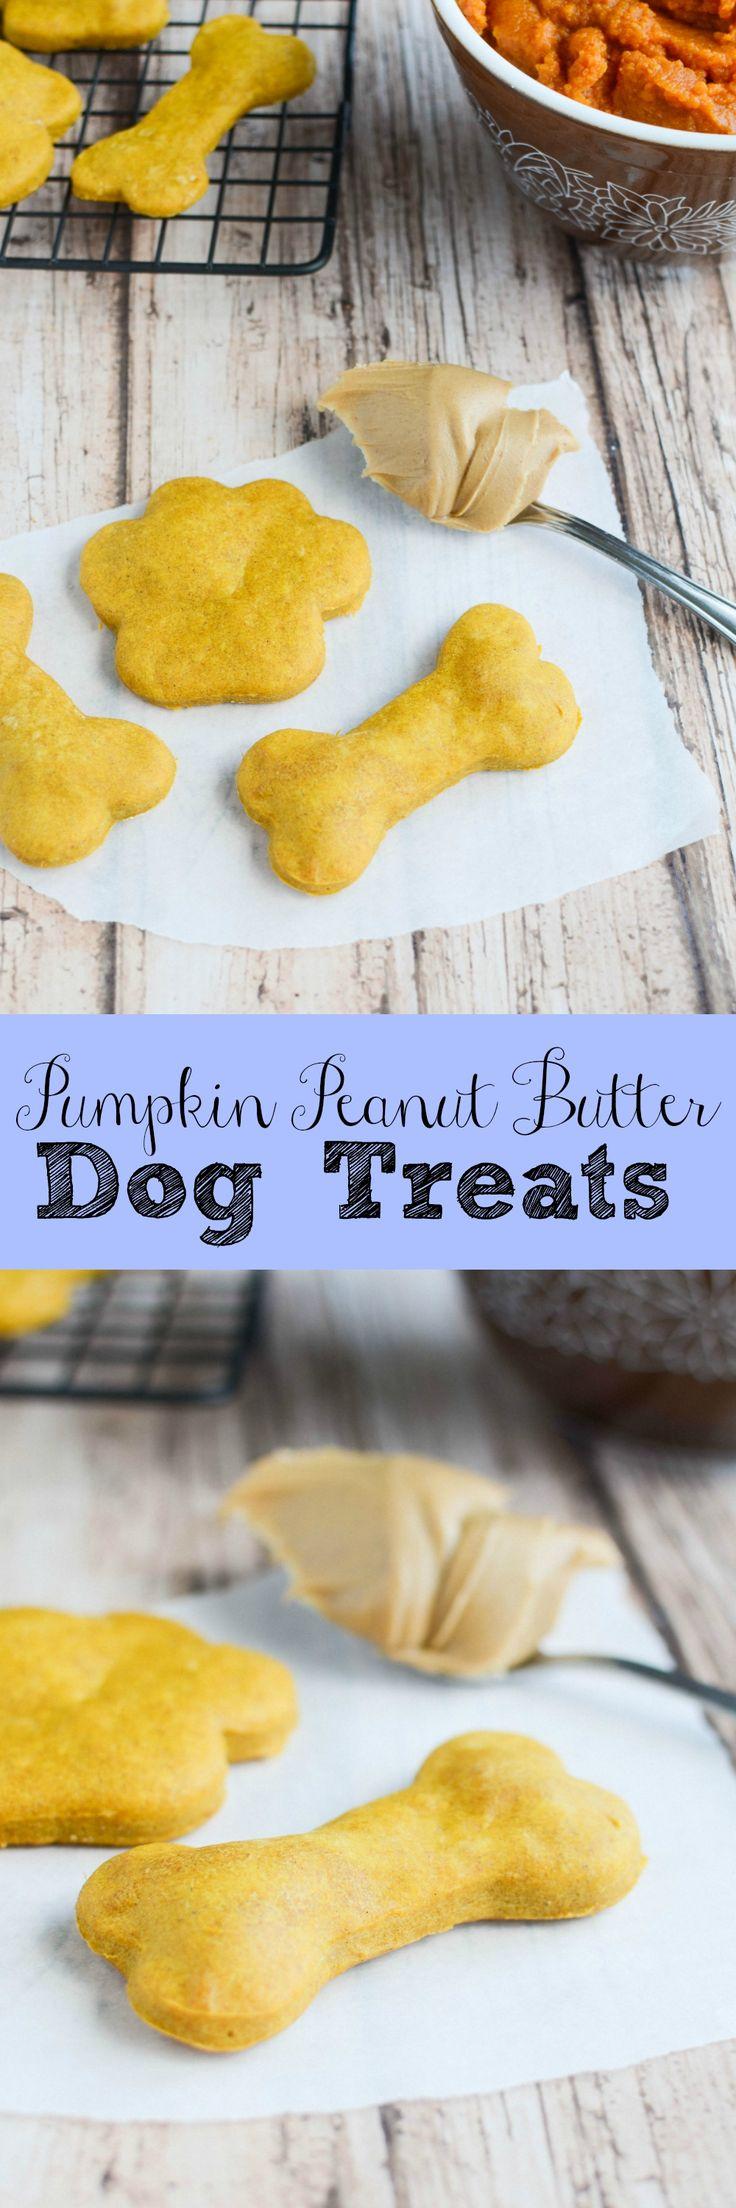 Pumpkin Peanut Butter Dog Treats - your pups will love these homemade dog treats!